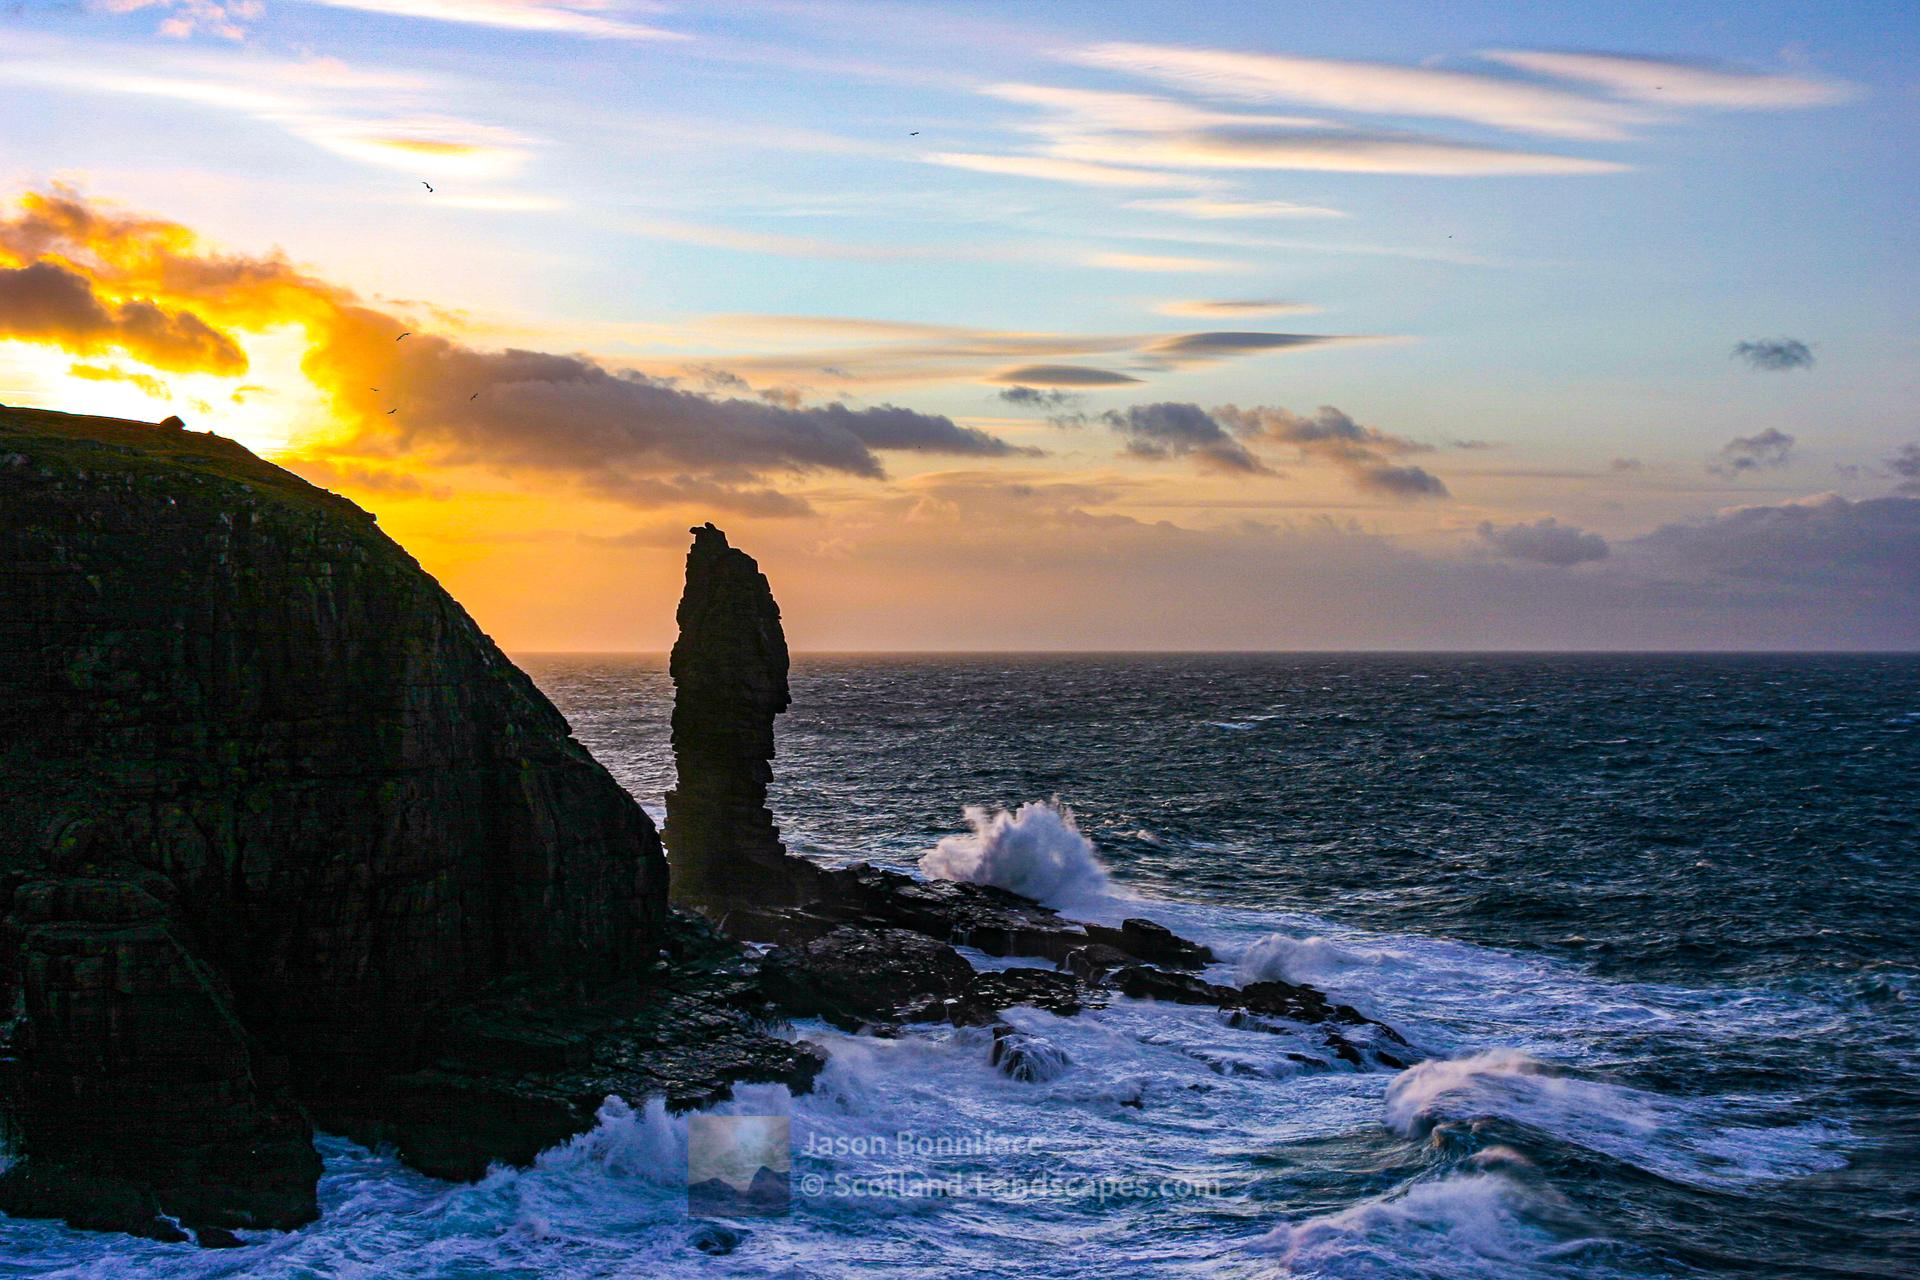 Sunset, The Old Man of Stoer, Assynt & Ullapool